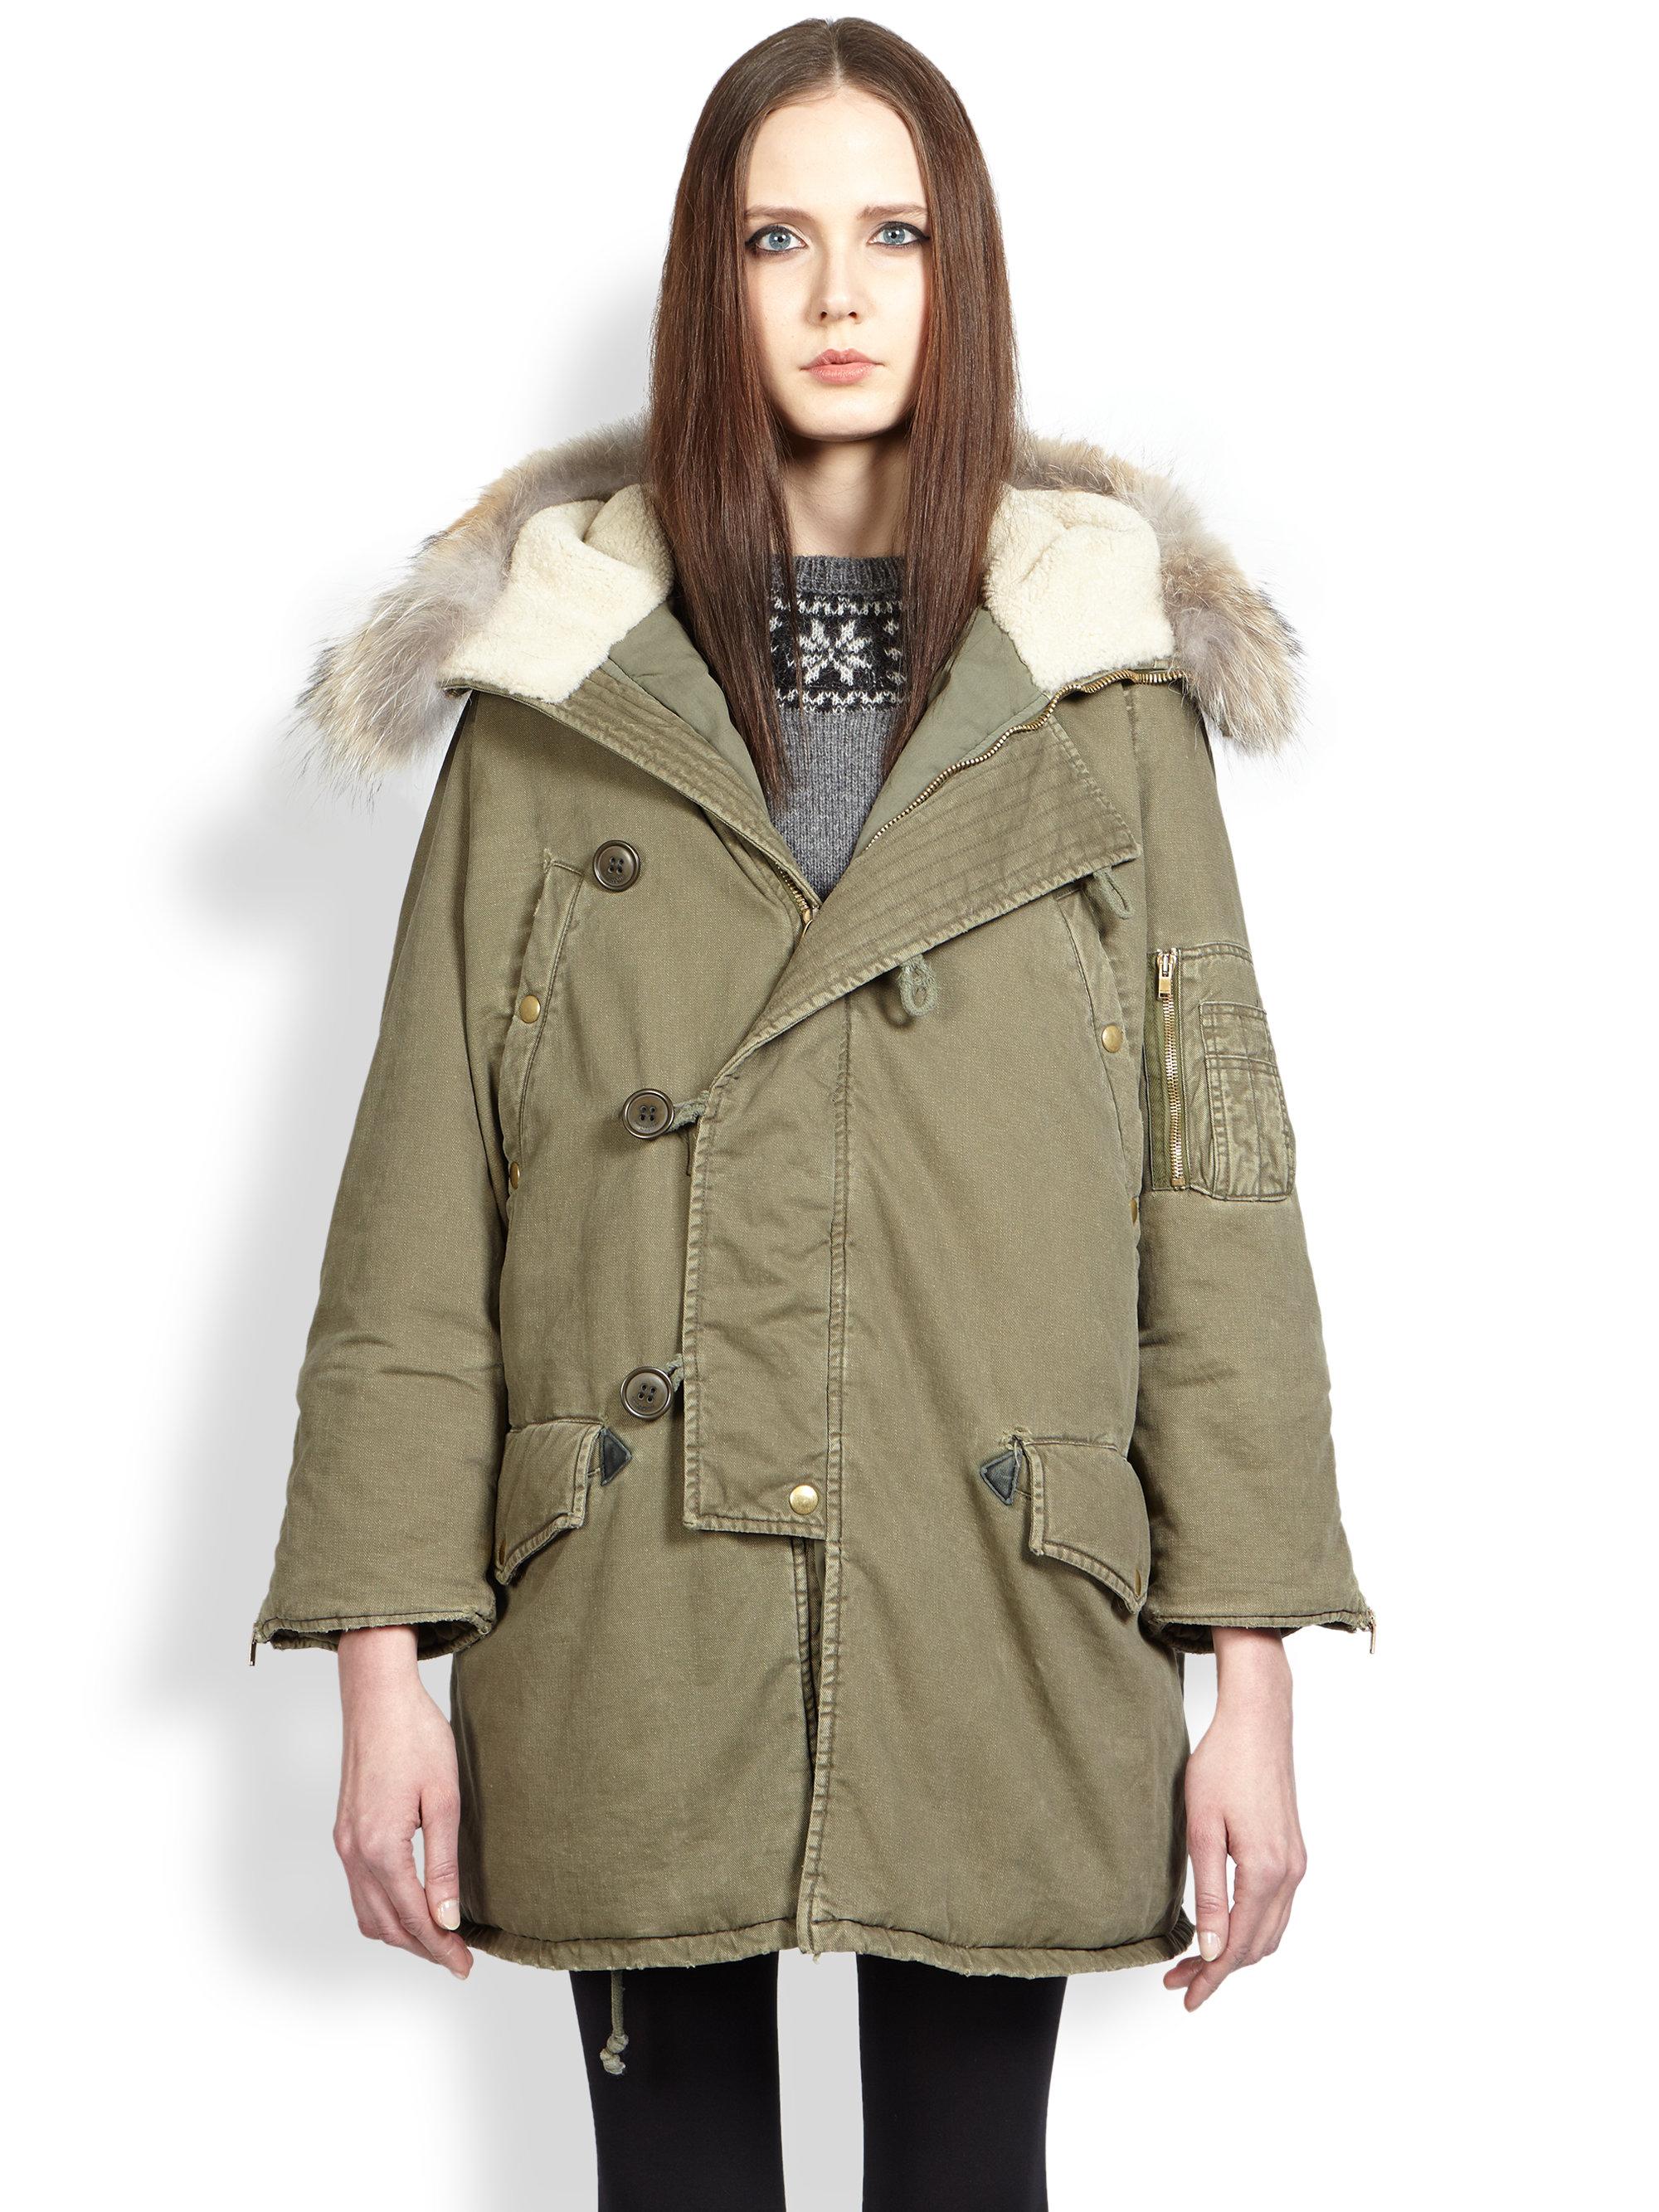 e83610208 Saint Laurent Green Fur-trimmed Army Parka